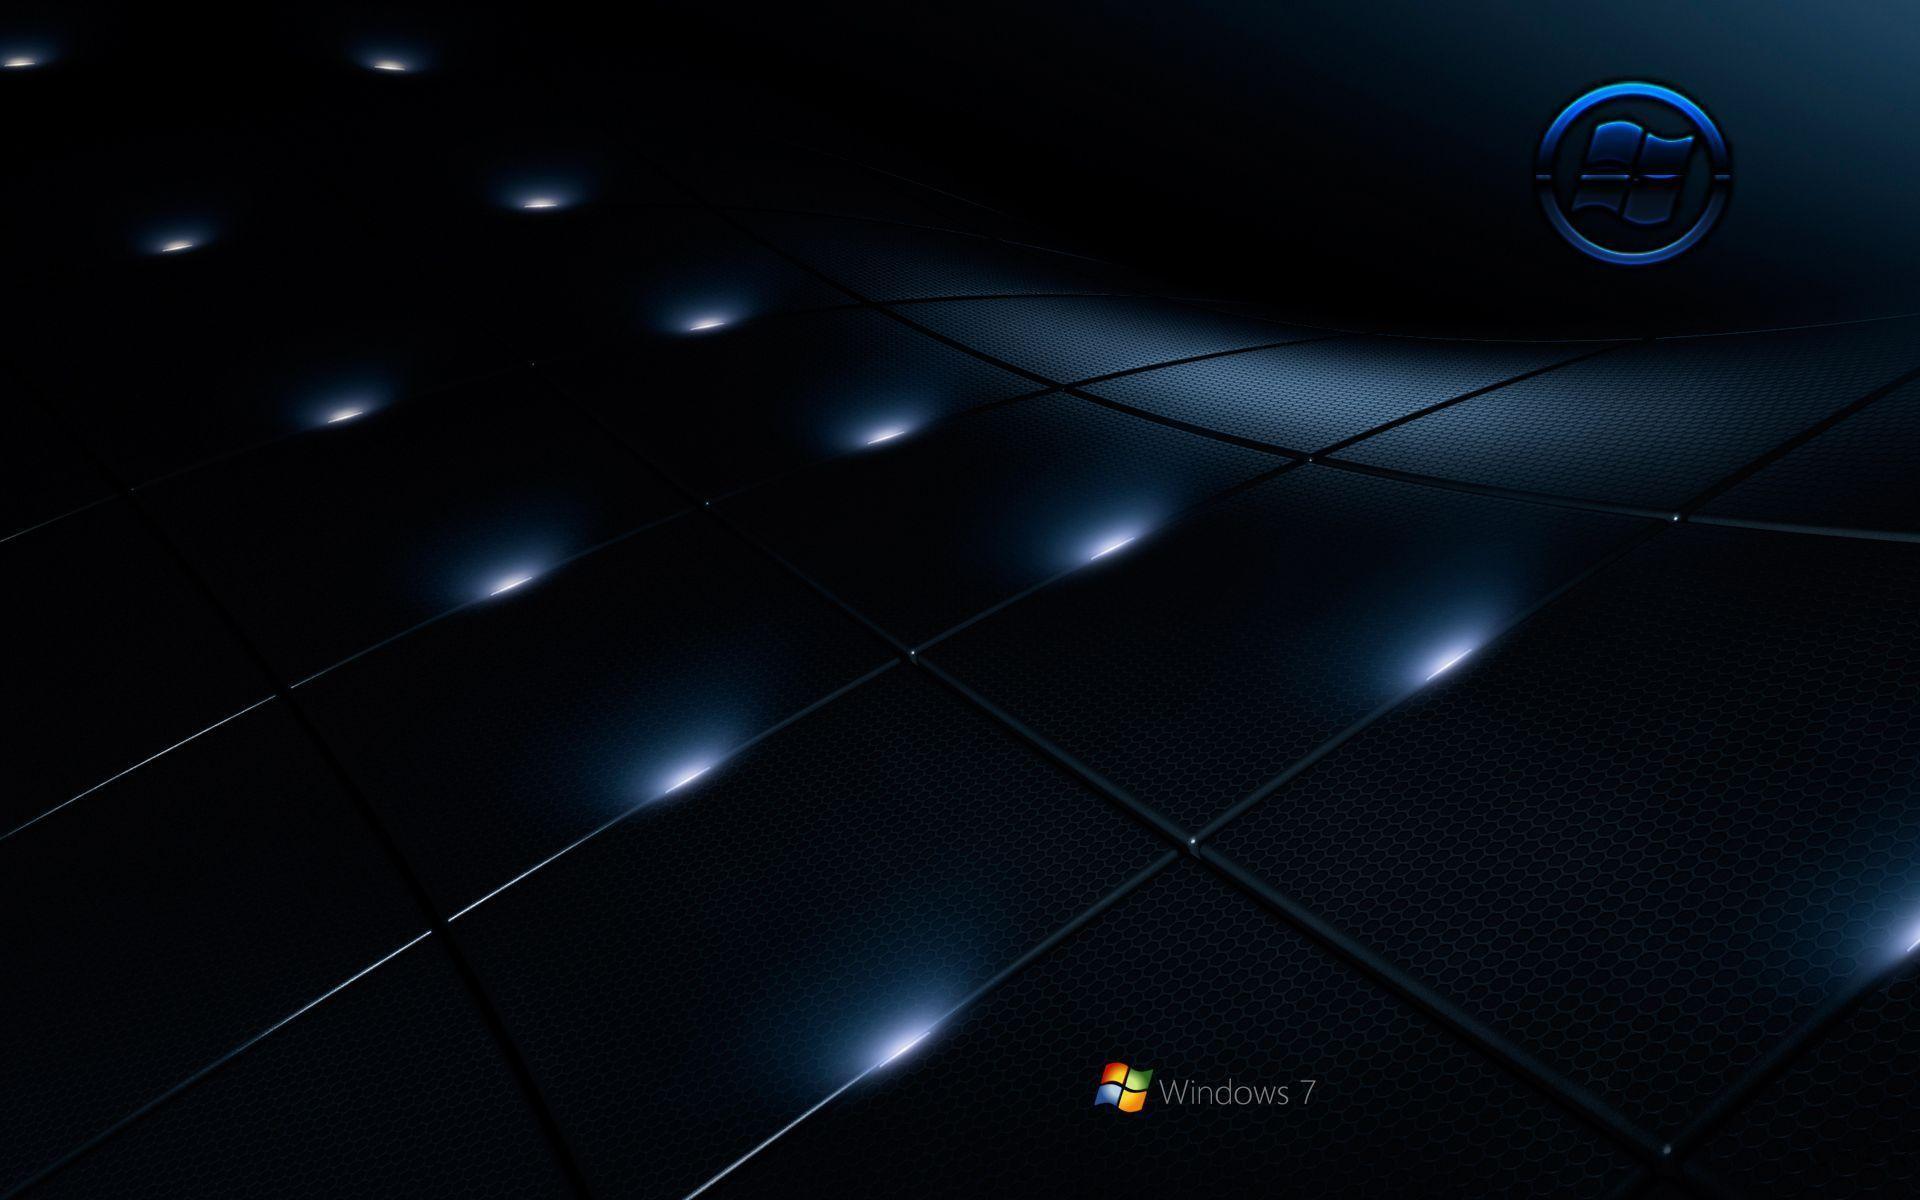 Windows 7 Black Wallpaper Wallpapertag